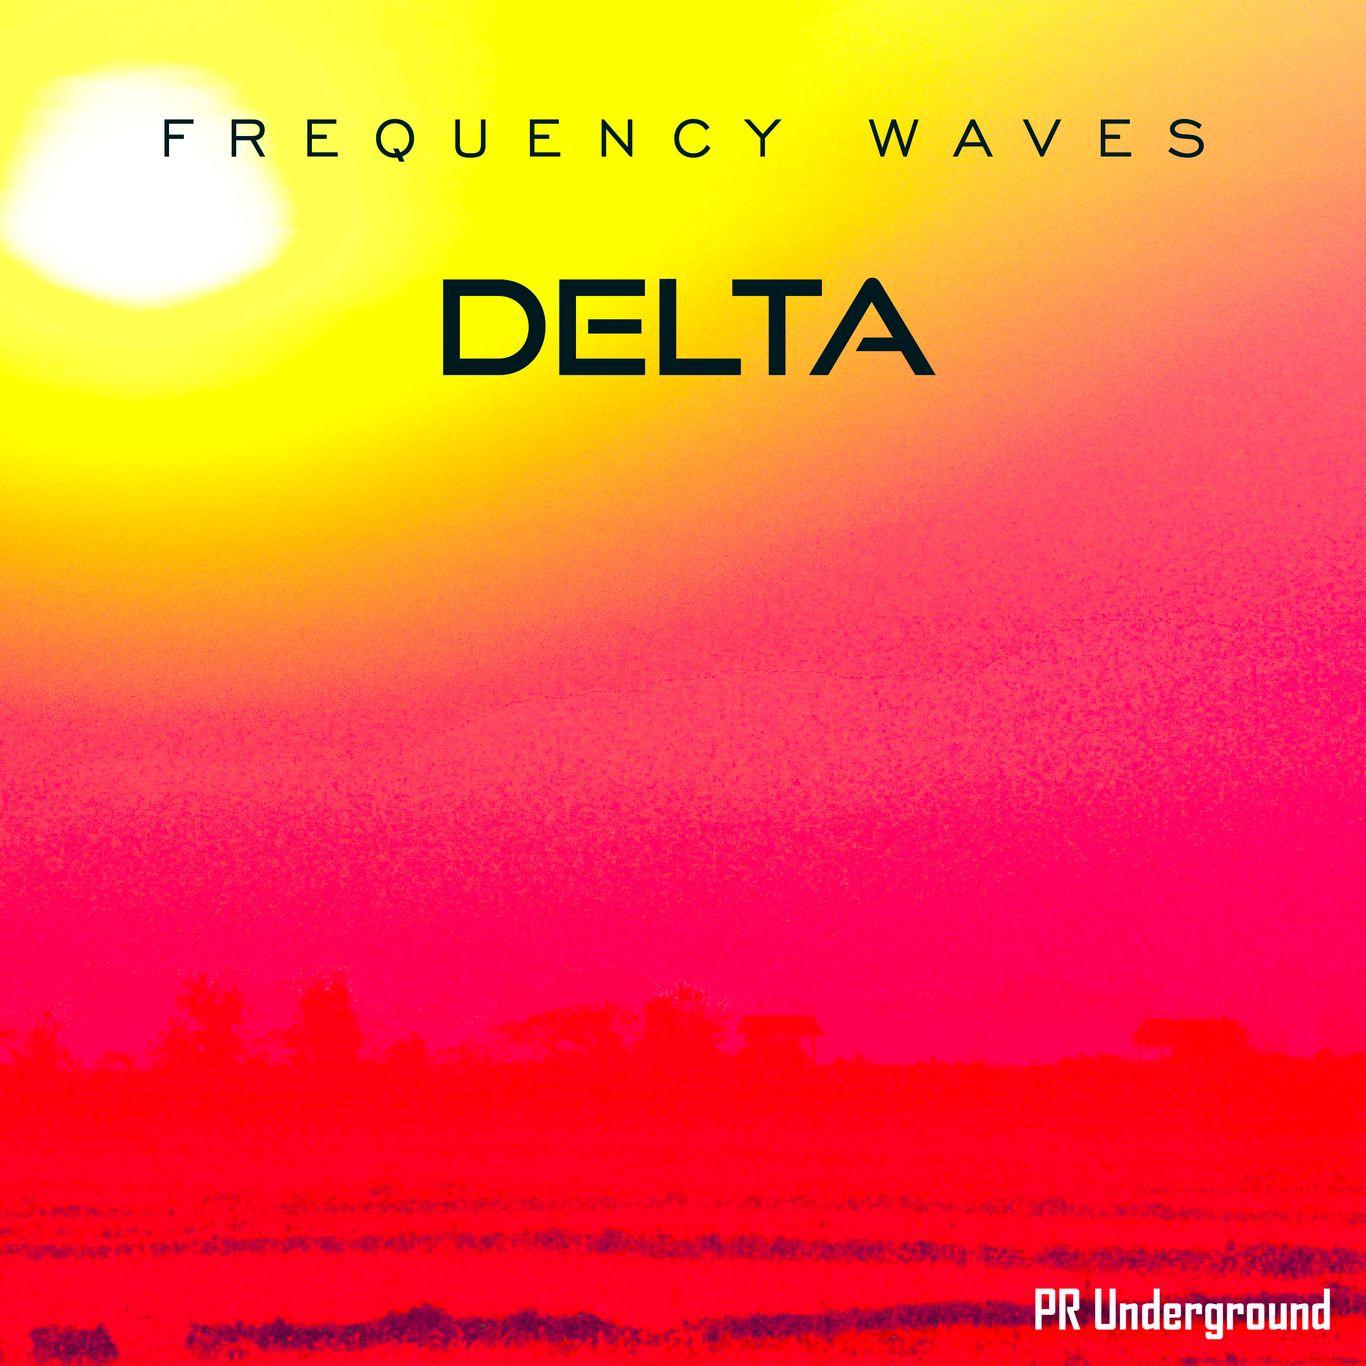 Peak (Juha Nikumaa Remix) by Materia, Shift Lock | Sample on Tracklib